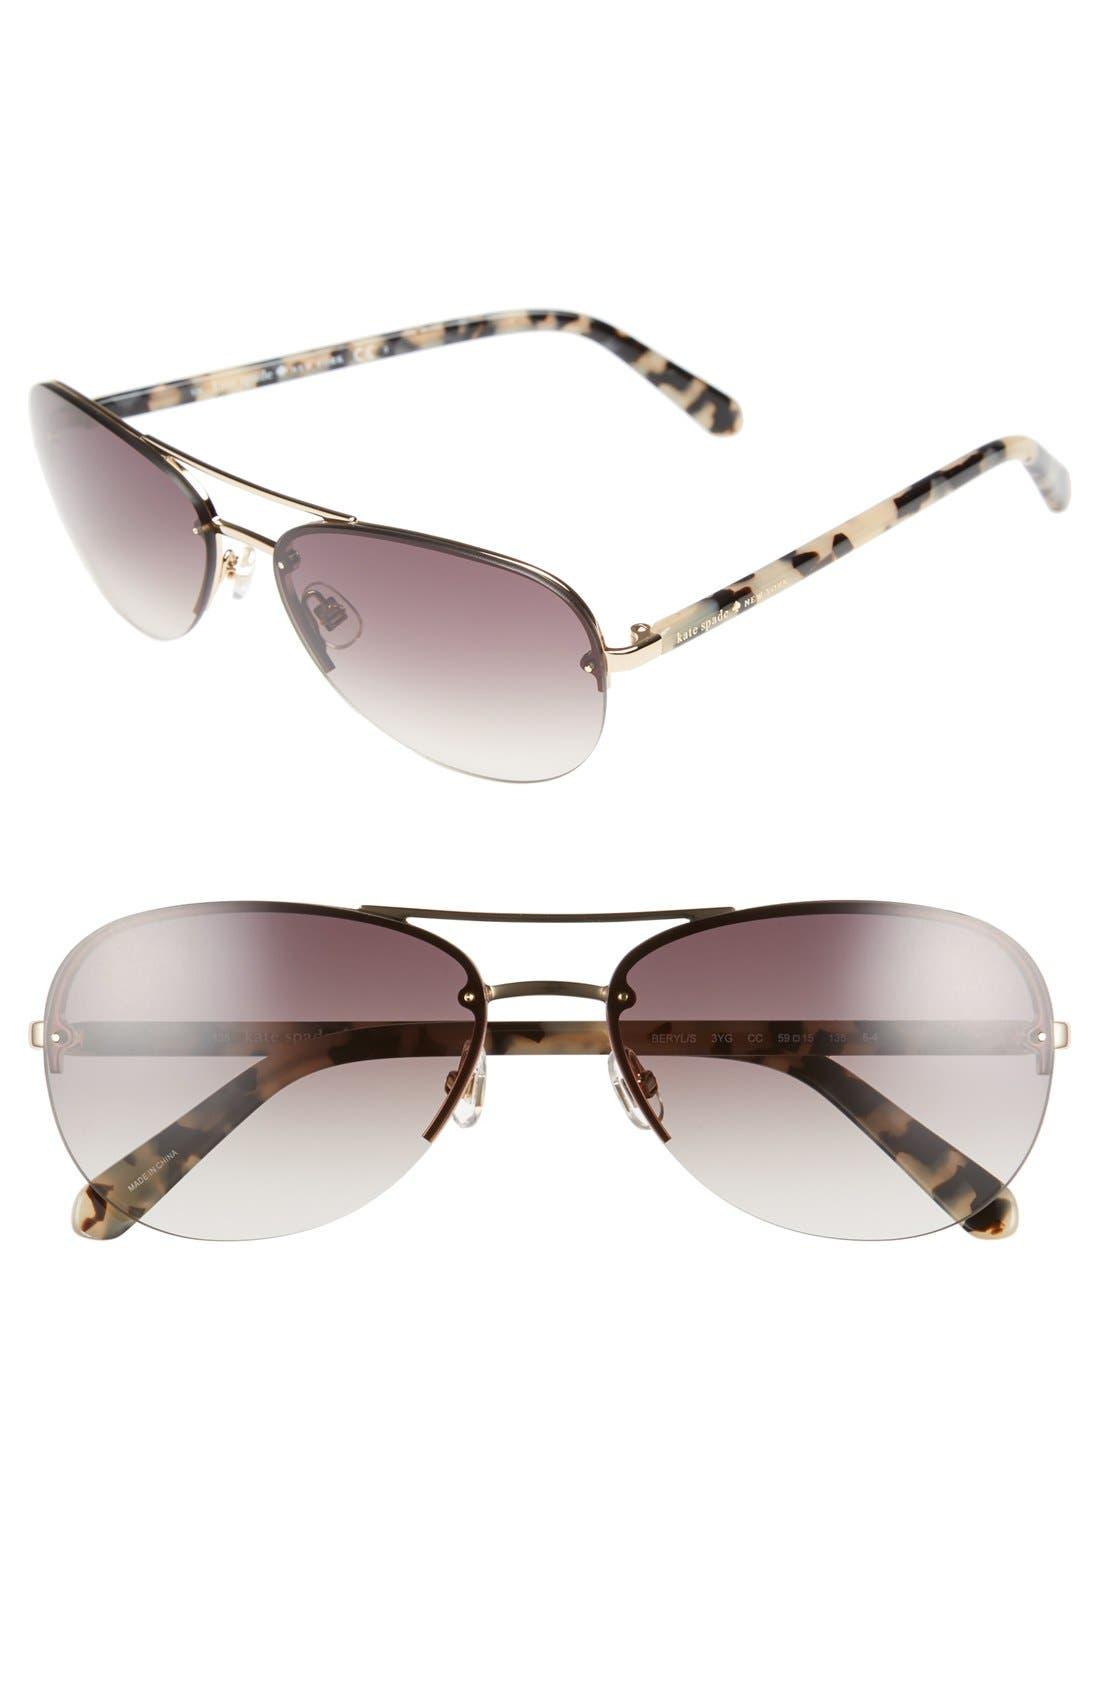 KATE SPADE NEW YORK beryls 59mm sunglasses